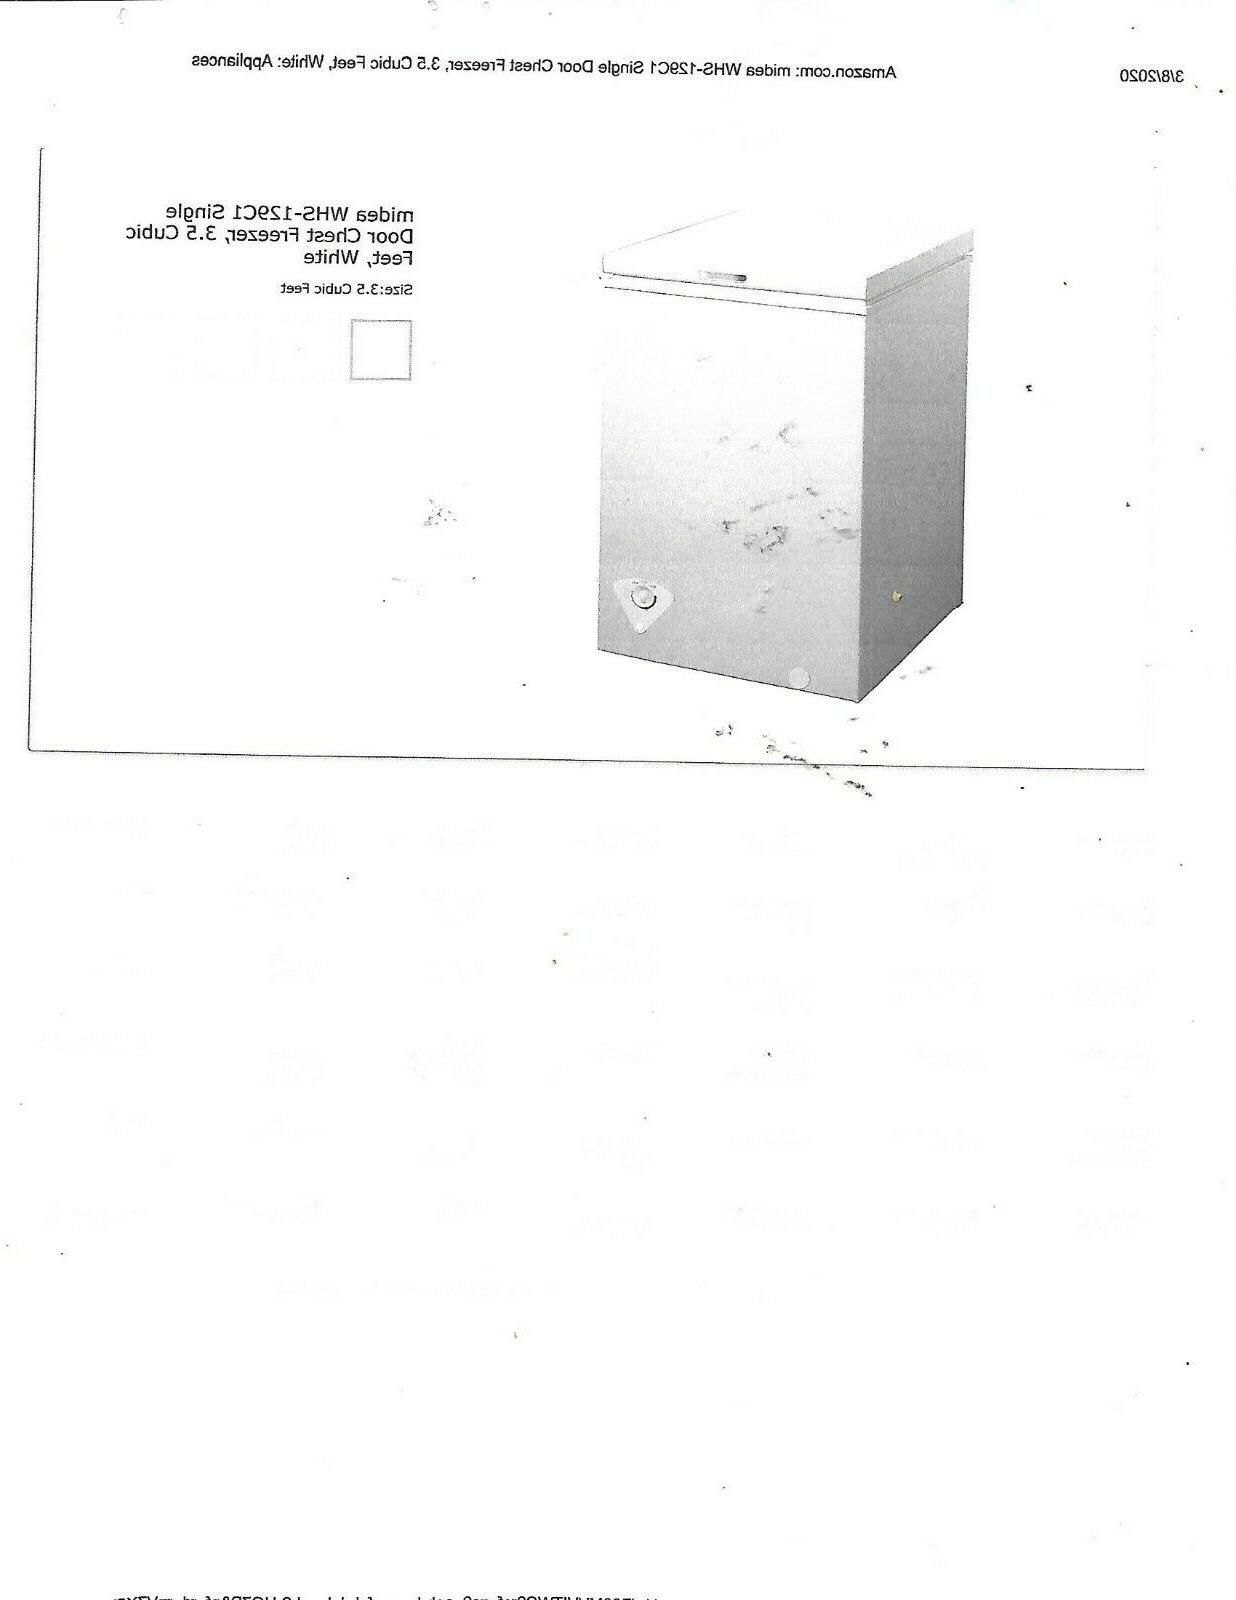 whs 129c1 single door chest freezer cubic